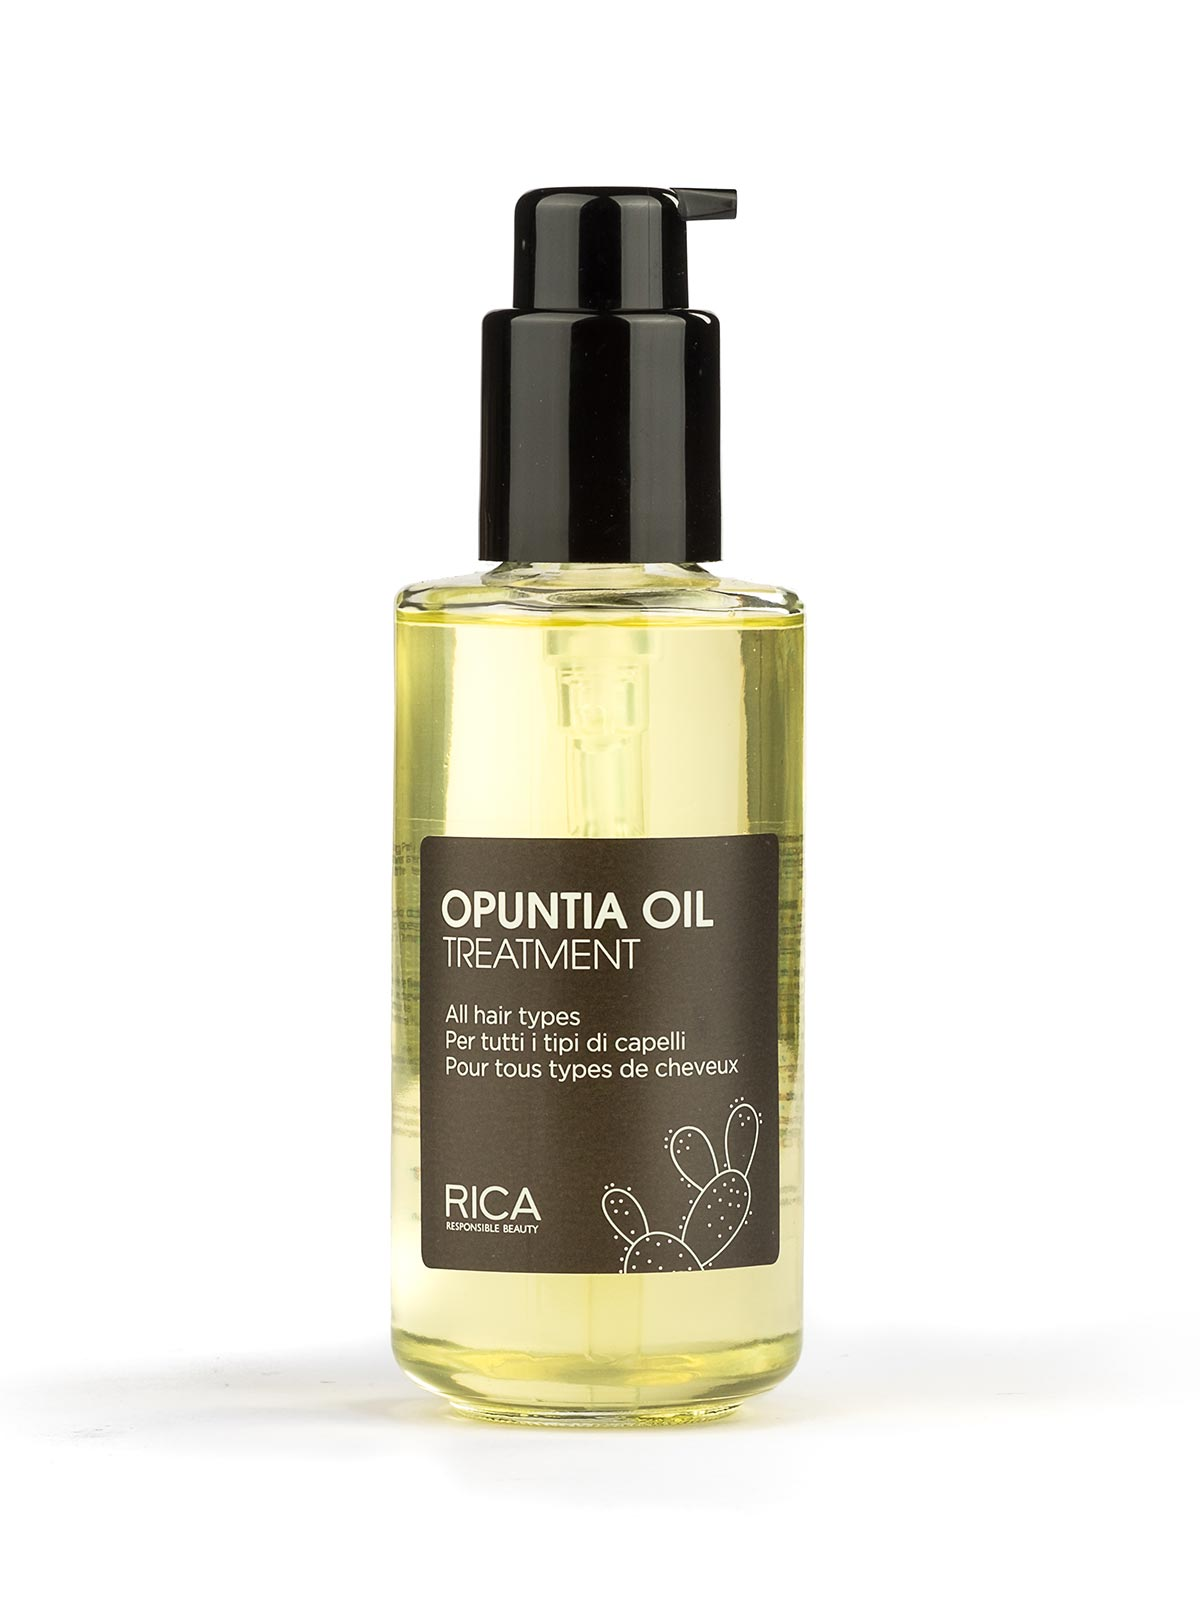 Rica Opuntia Oil Treatment